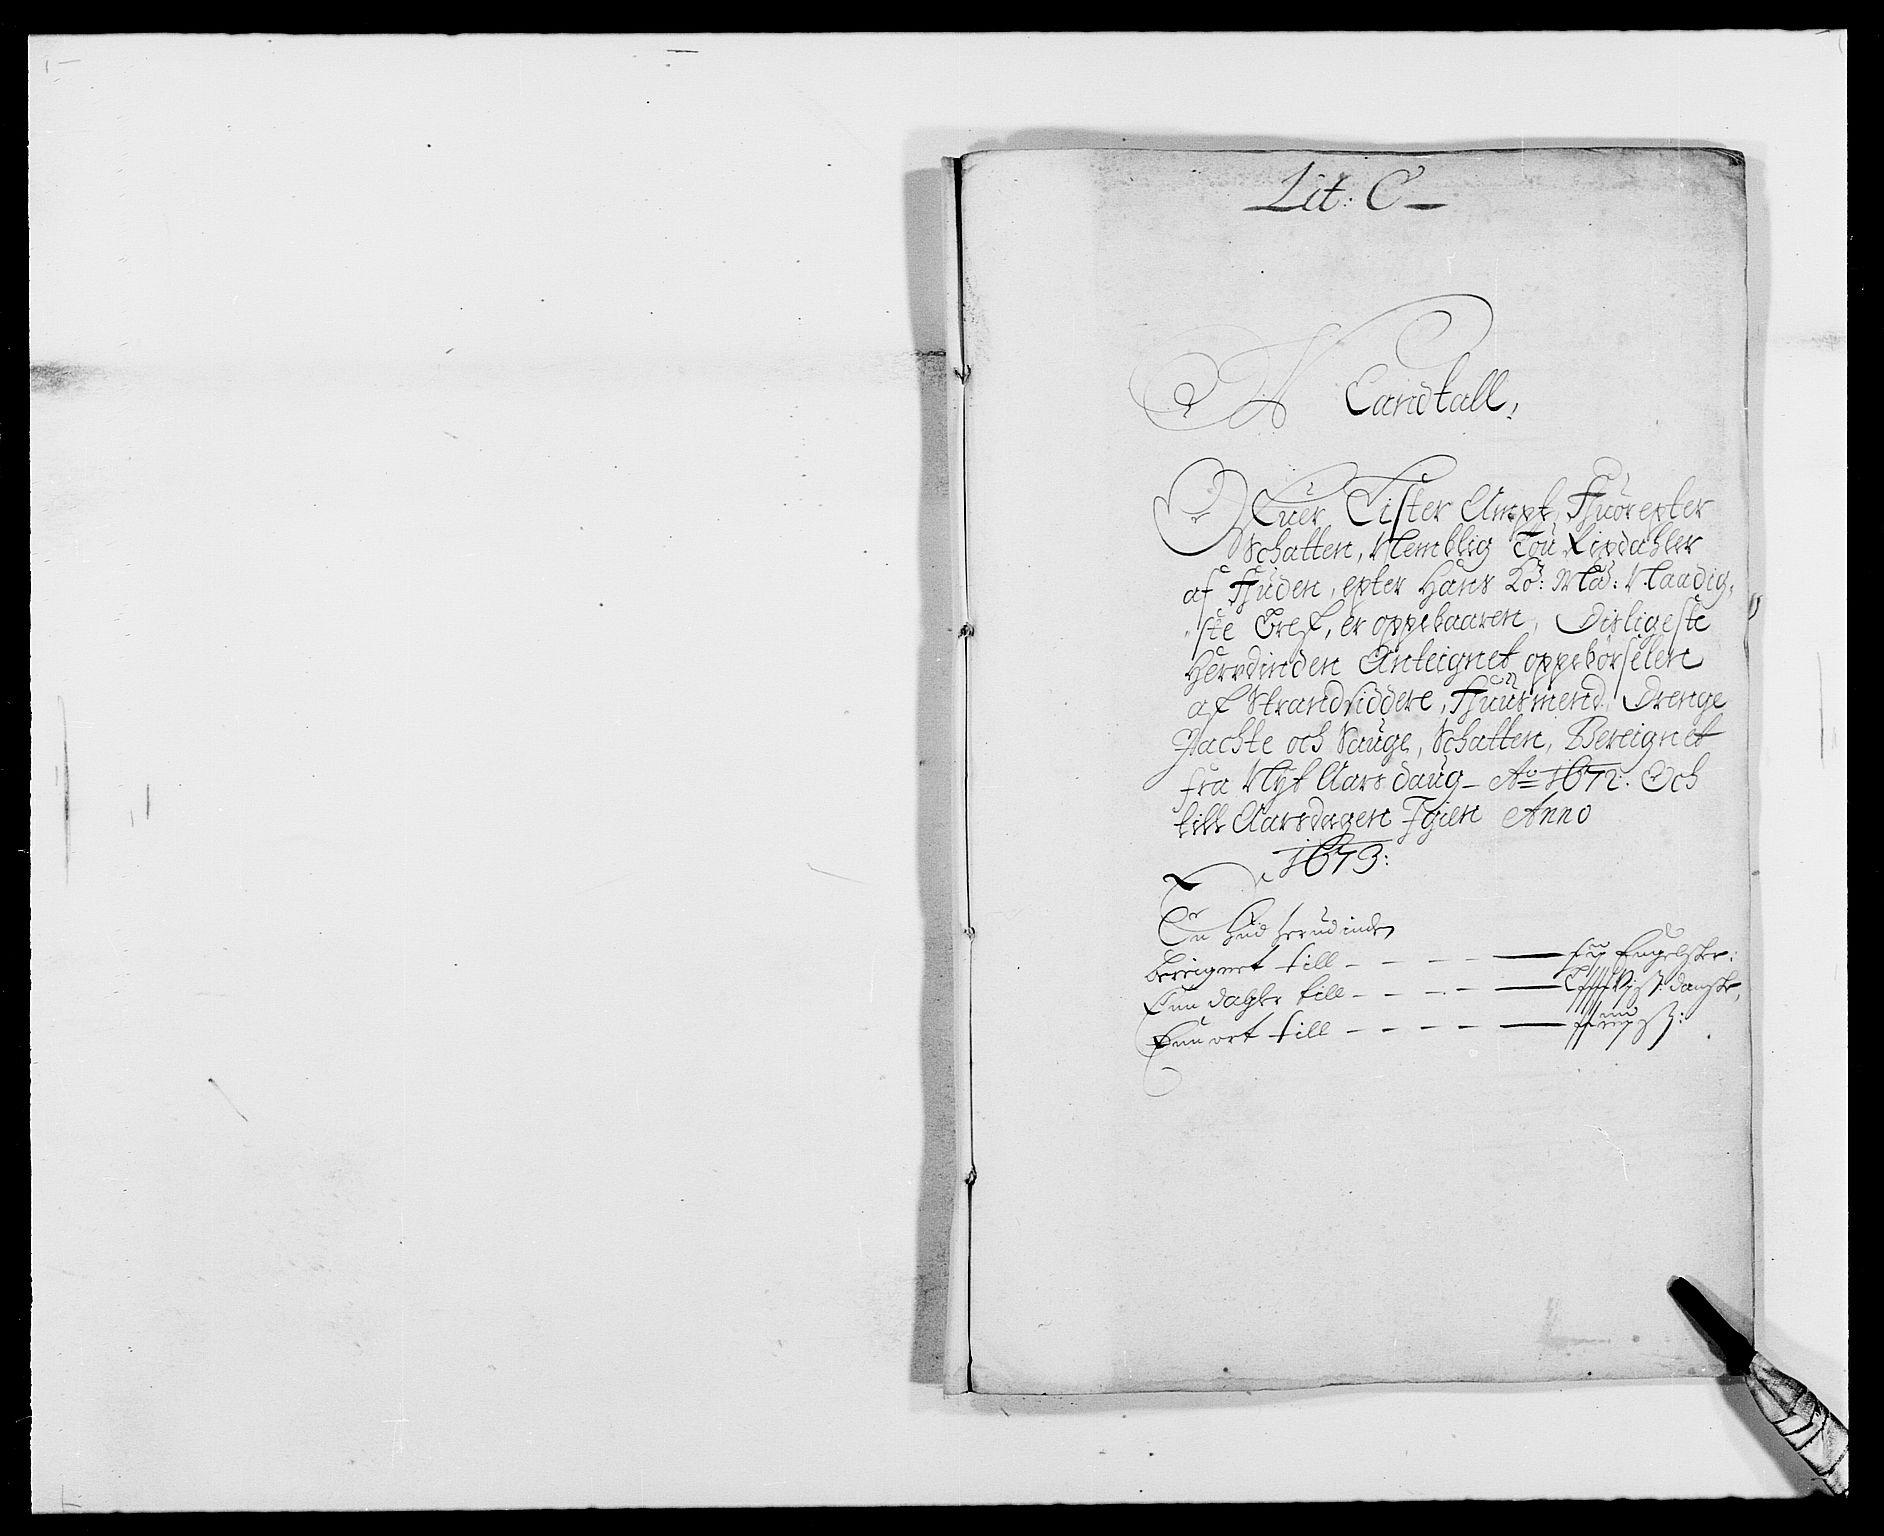 RA, Rentekammeret inntil 1814, Reviderte regnskaper, Fogderegnskap, R41/L2526: Fogderegnskap Lista, 1672, s. 96